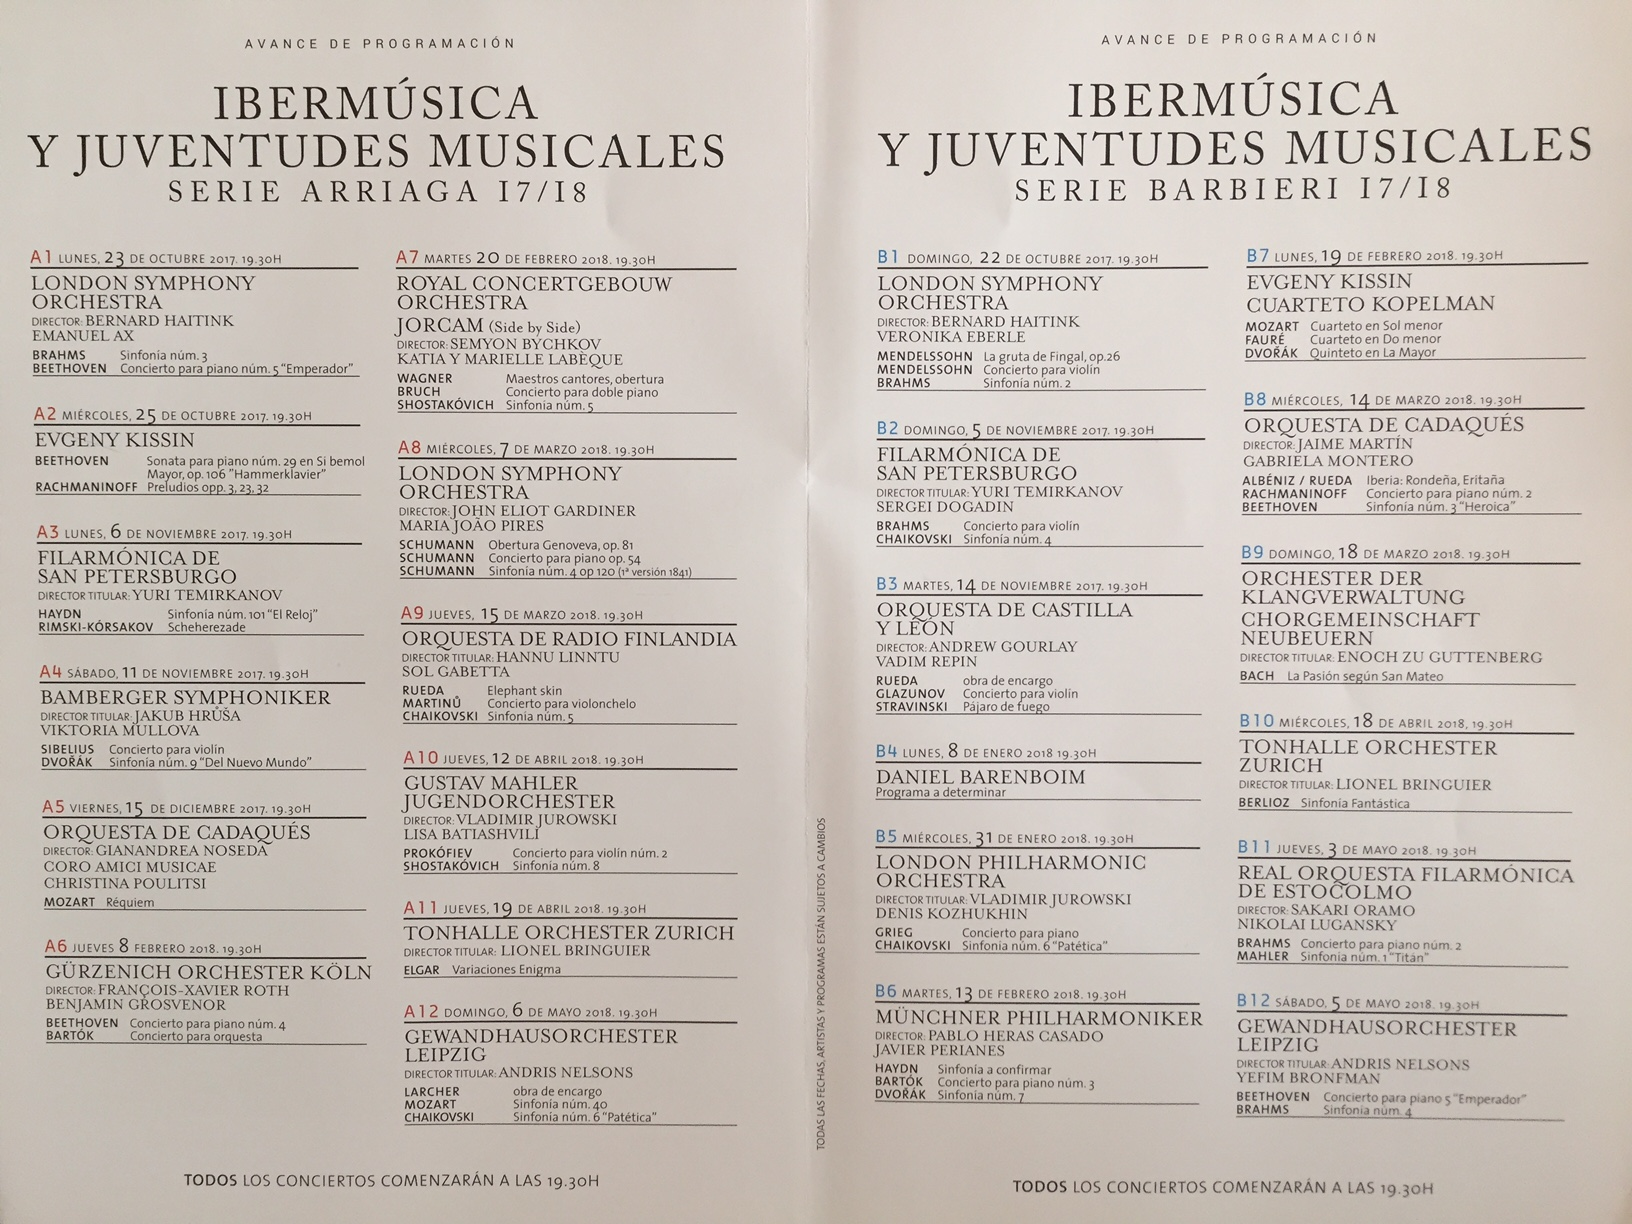 Temporada de Ibermúsica/Juventudes Musicales 2017/18